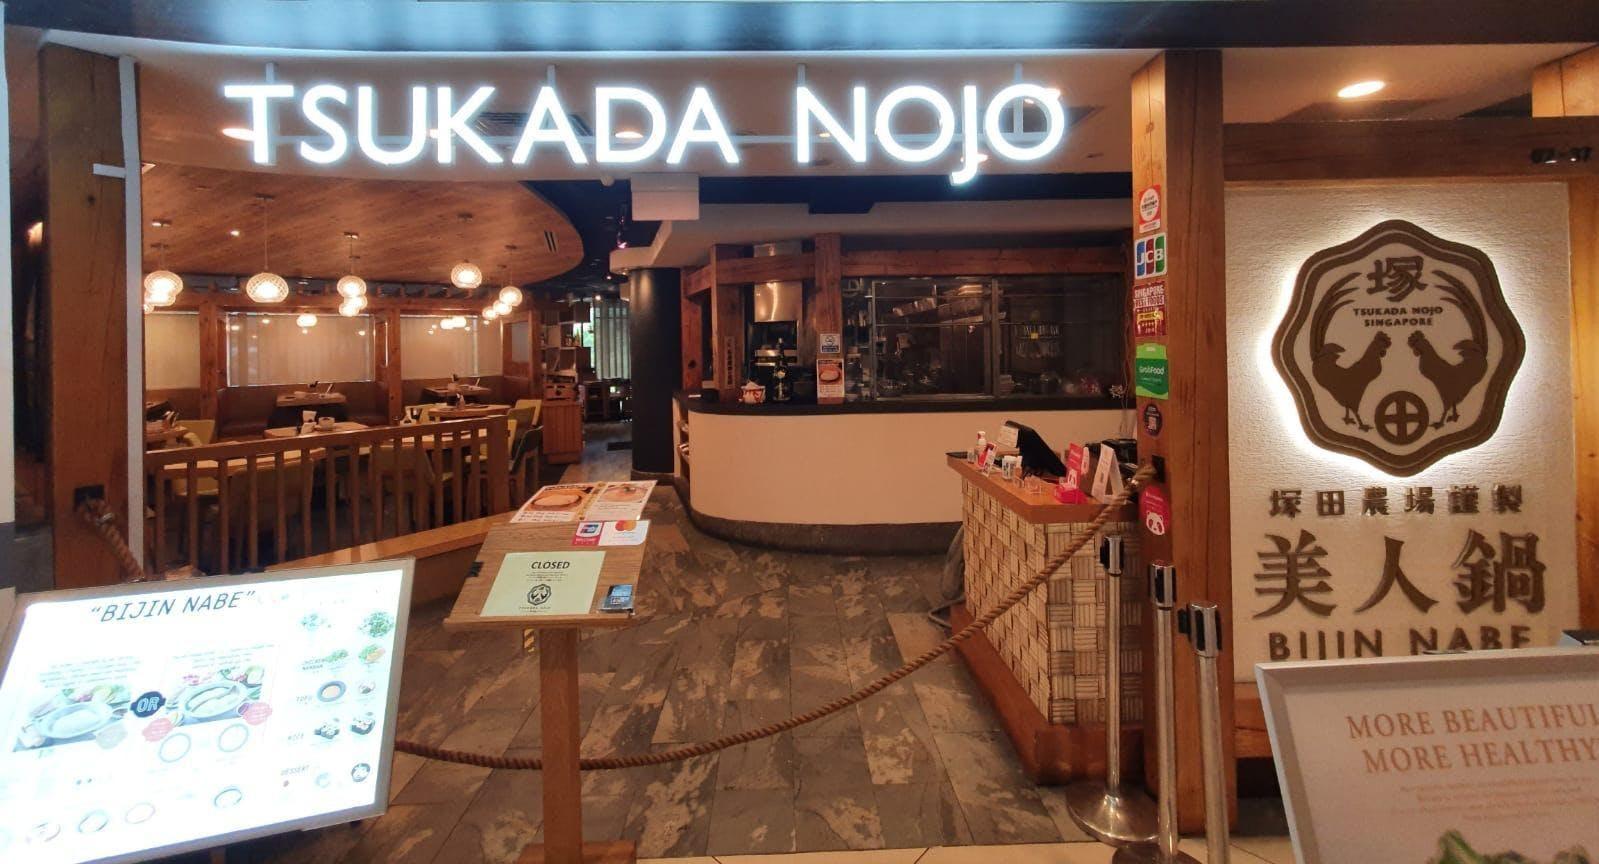 Tsukada Nojo - Chinatown Point